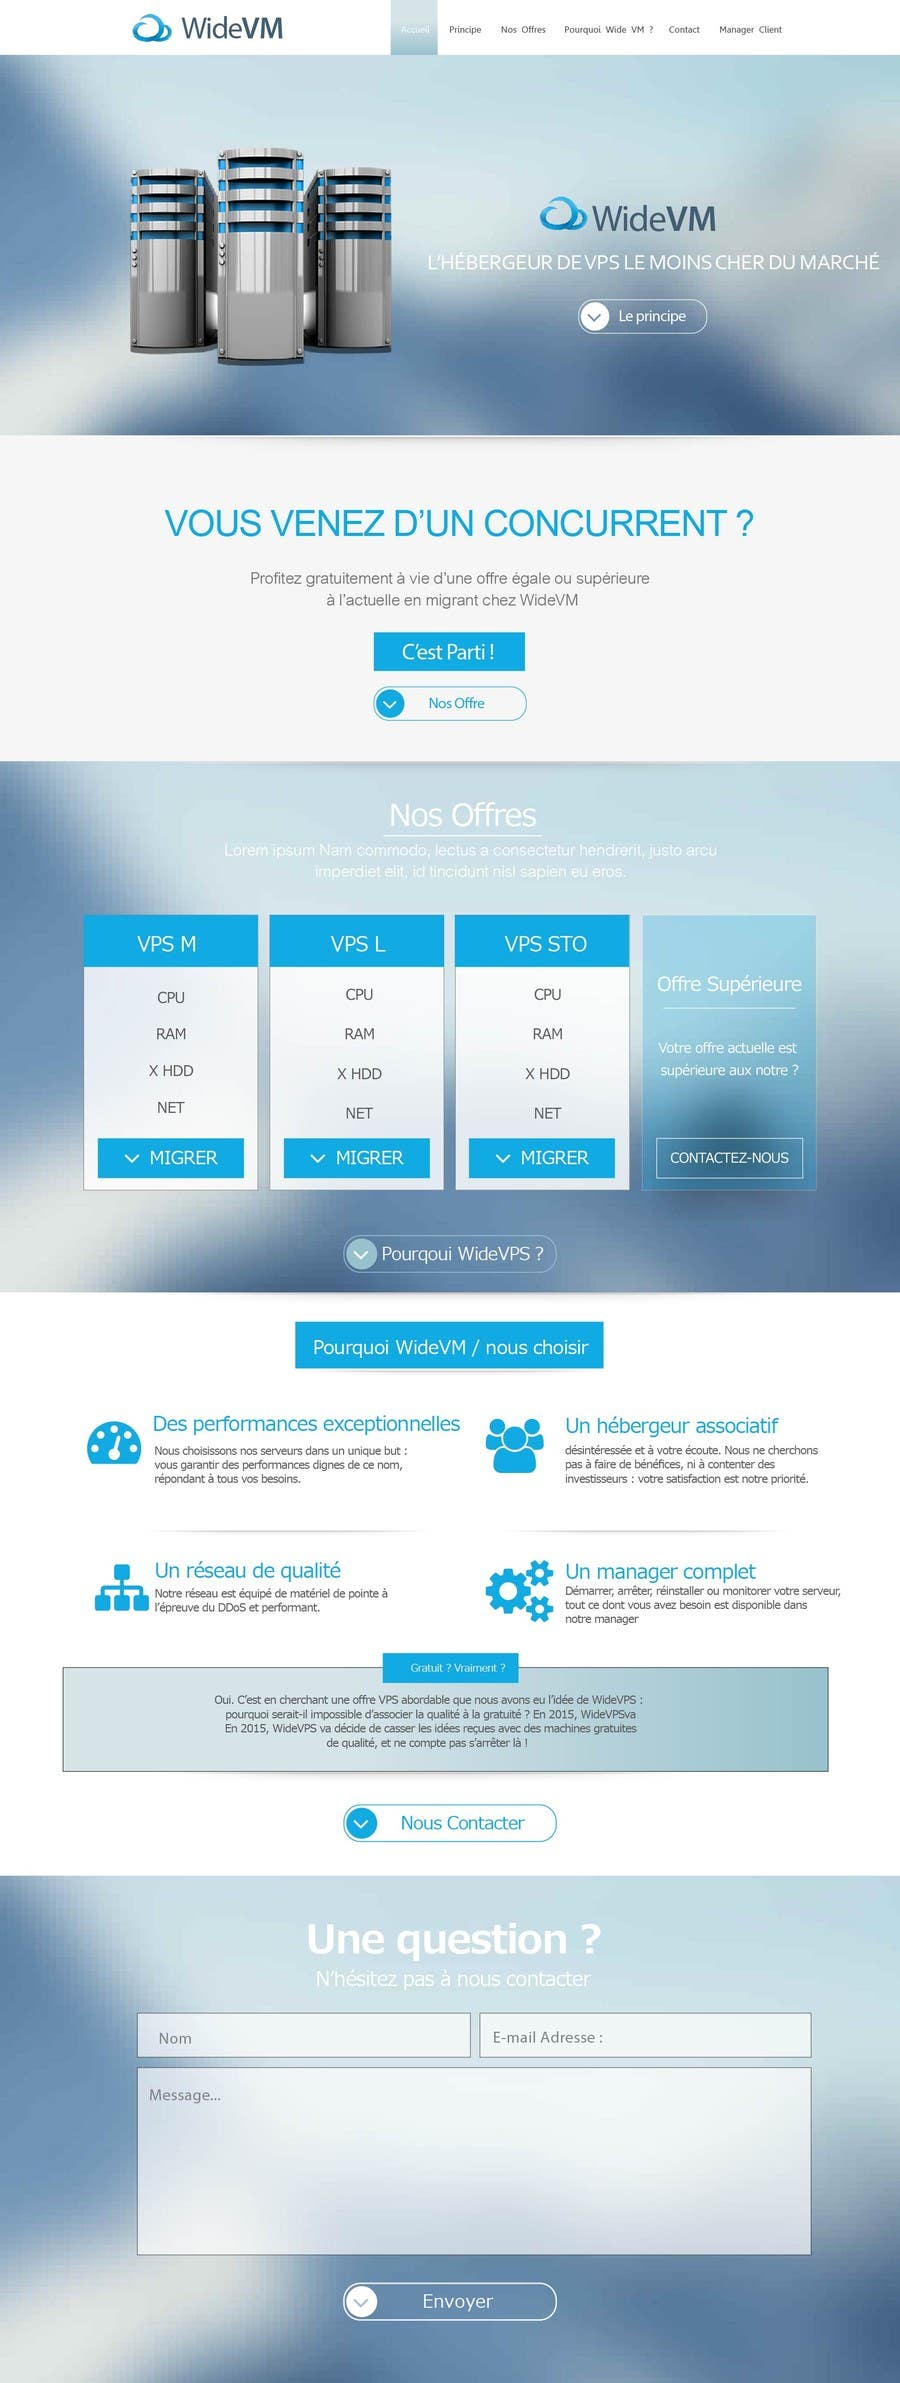 Penyertaan Peraduan #4 untuk Concevez une maquette de site Web